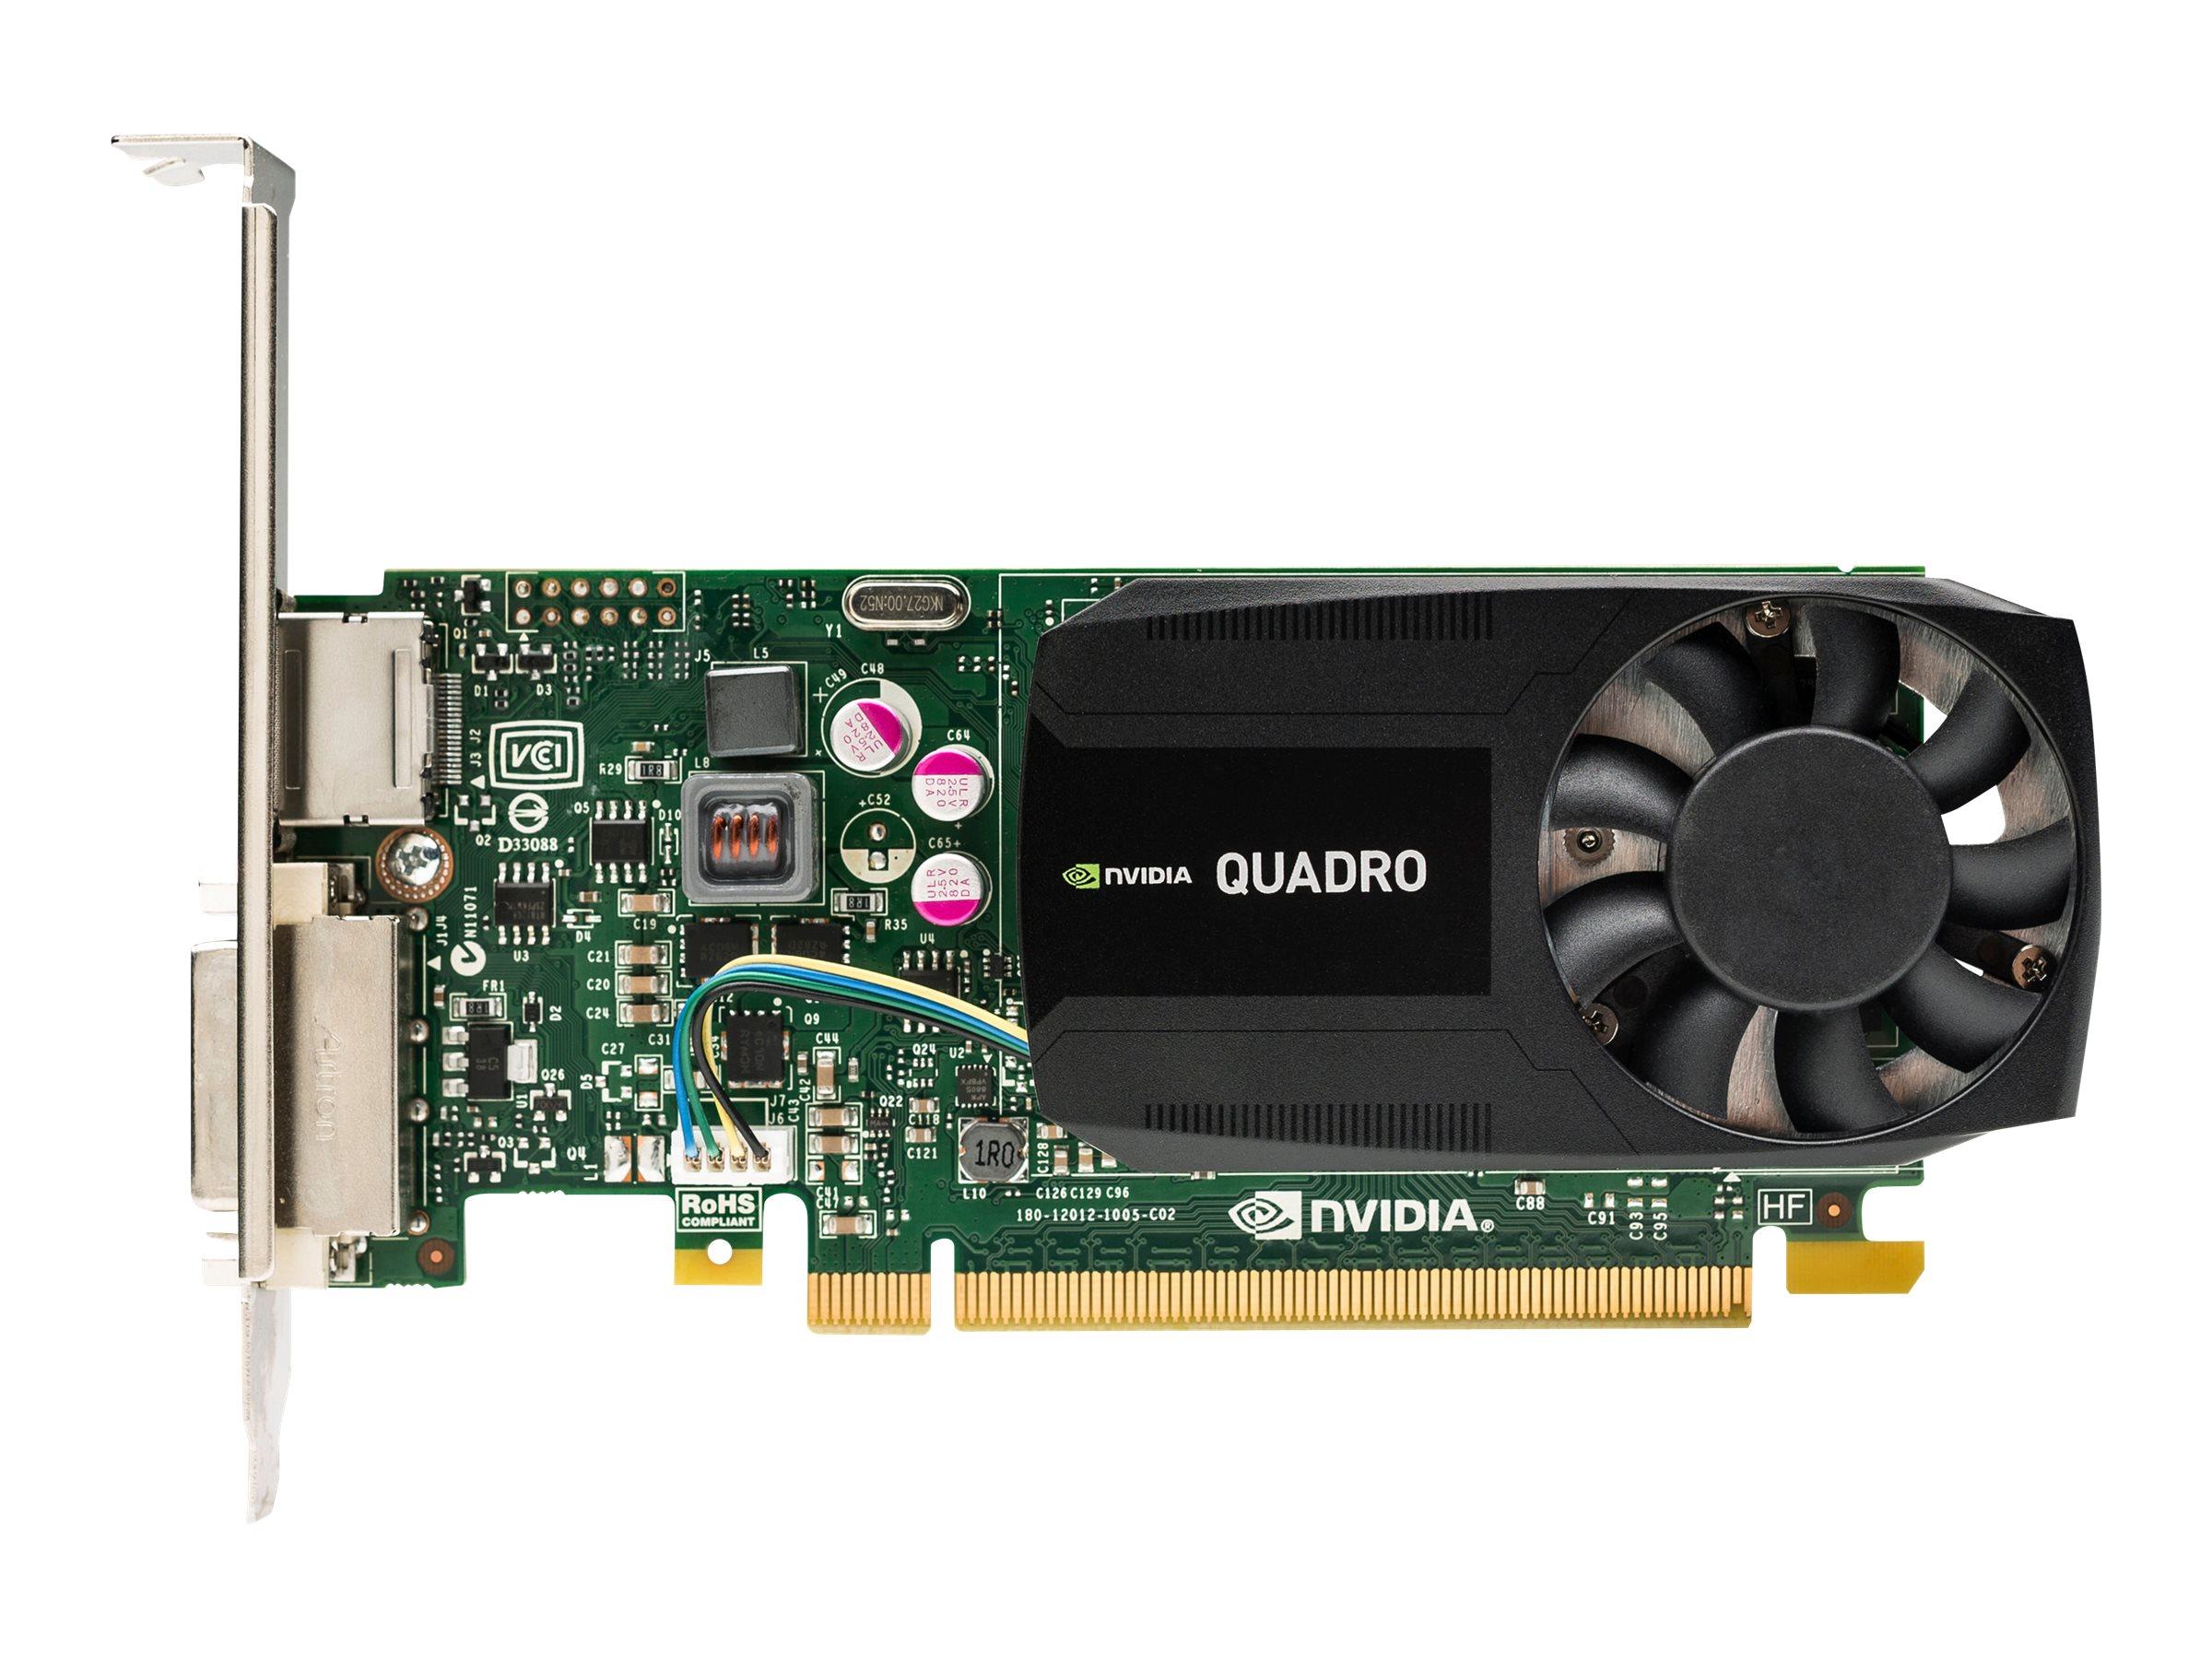 NVIDIA Quadro K620 - Grafikkarten - Quadro K620 - 2 GB DDR3 - PCIe 2.0 x16 Low-Profile - DVI, DisplayPort